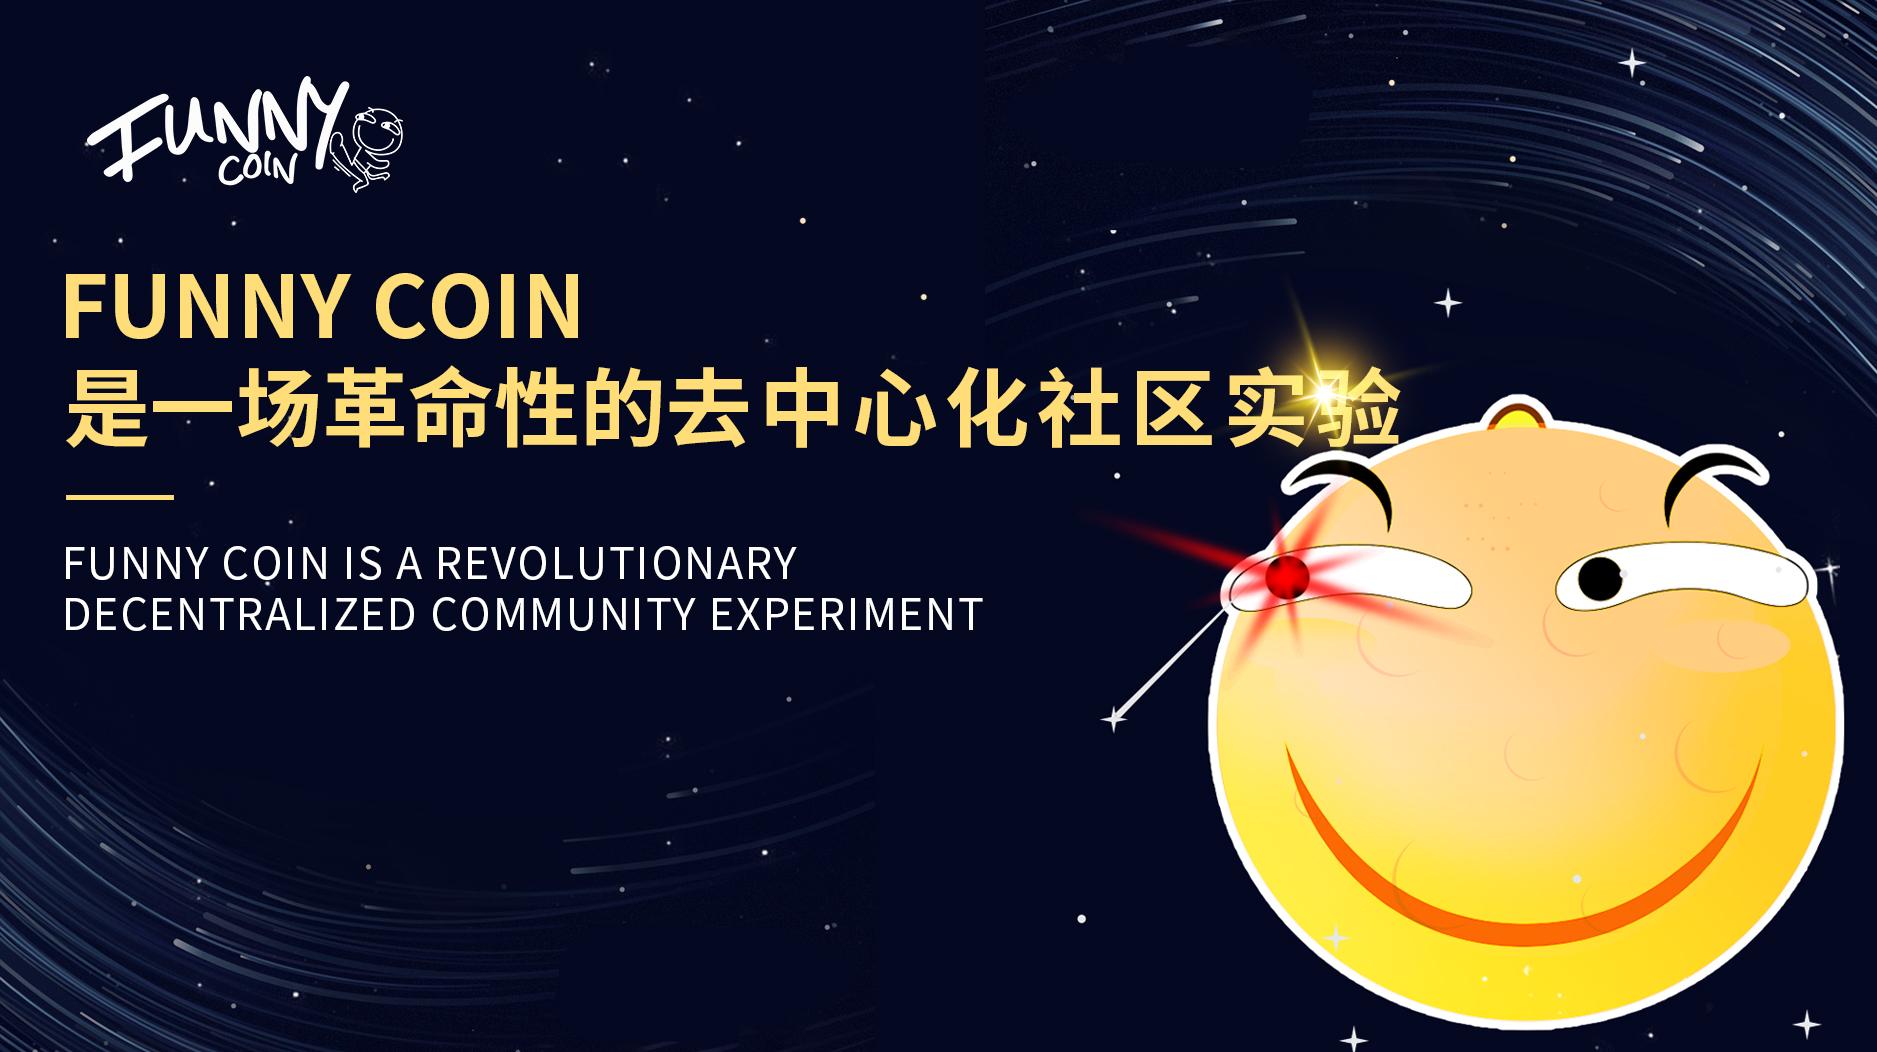 http://img.toumeiw.cn/upload/images/20210607/57b66ef78401d64959bcfcfbdf578d9b.jpg